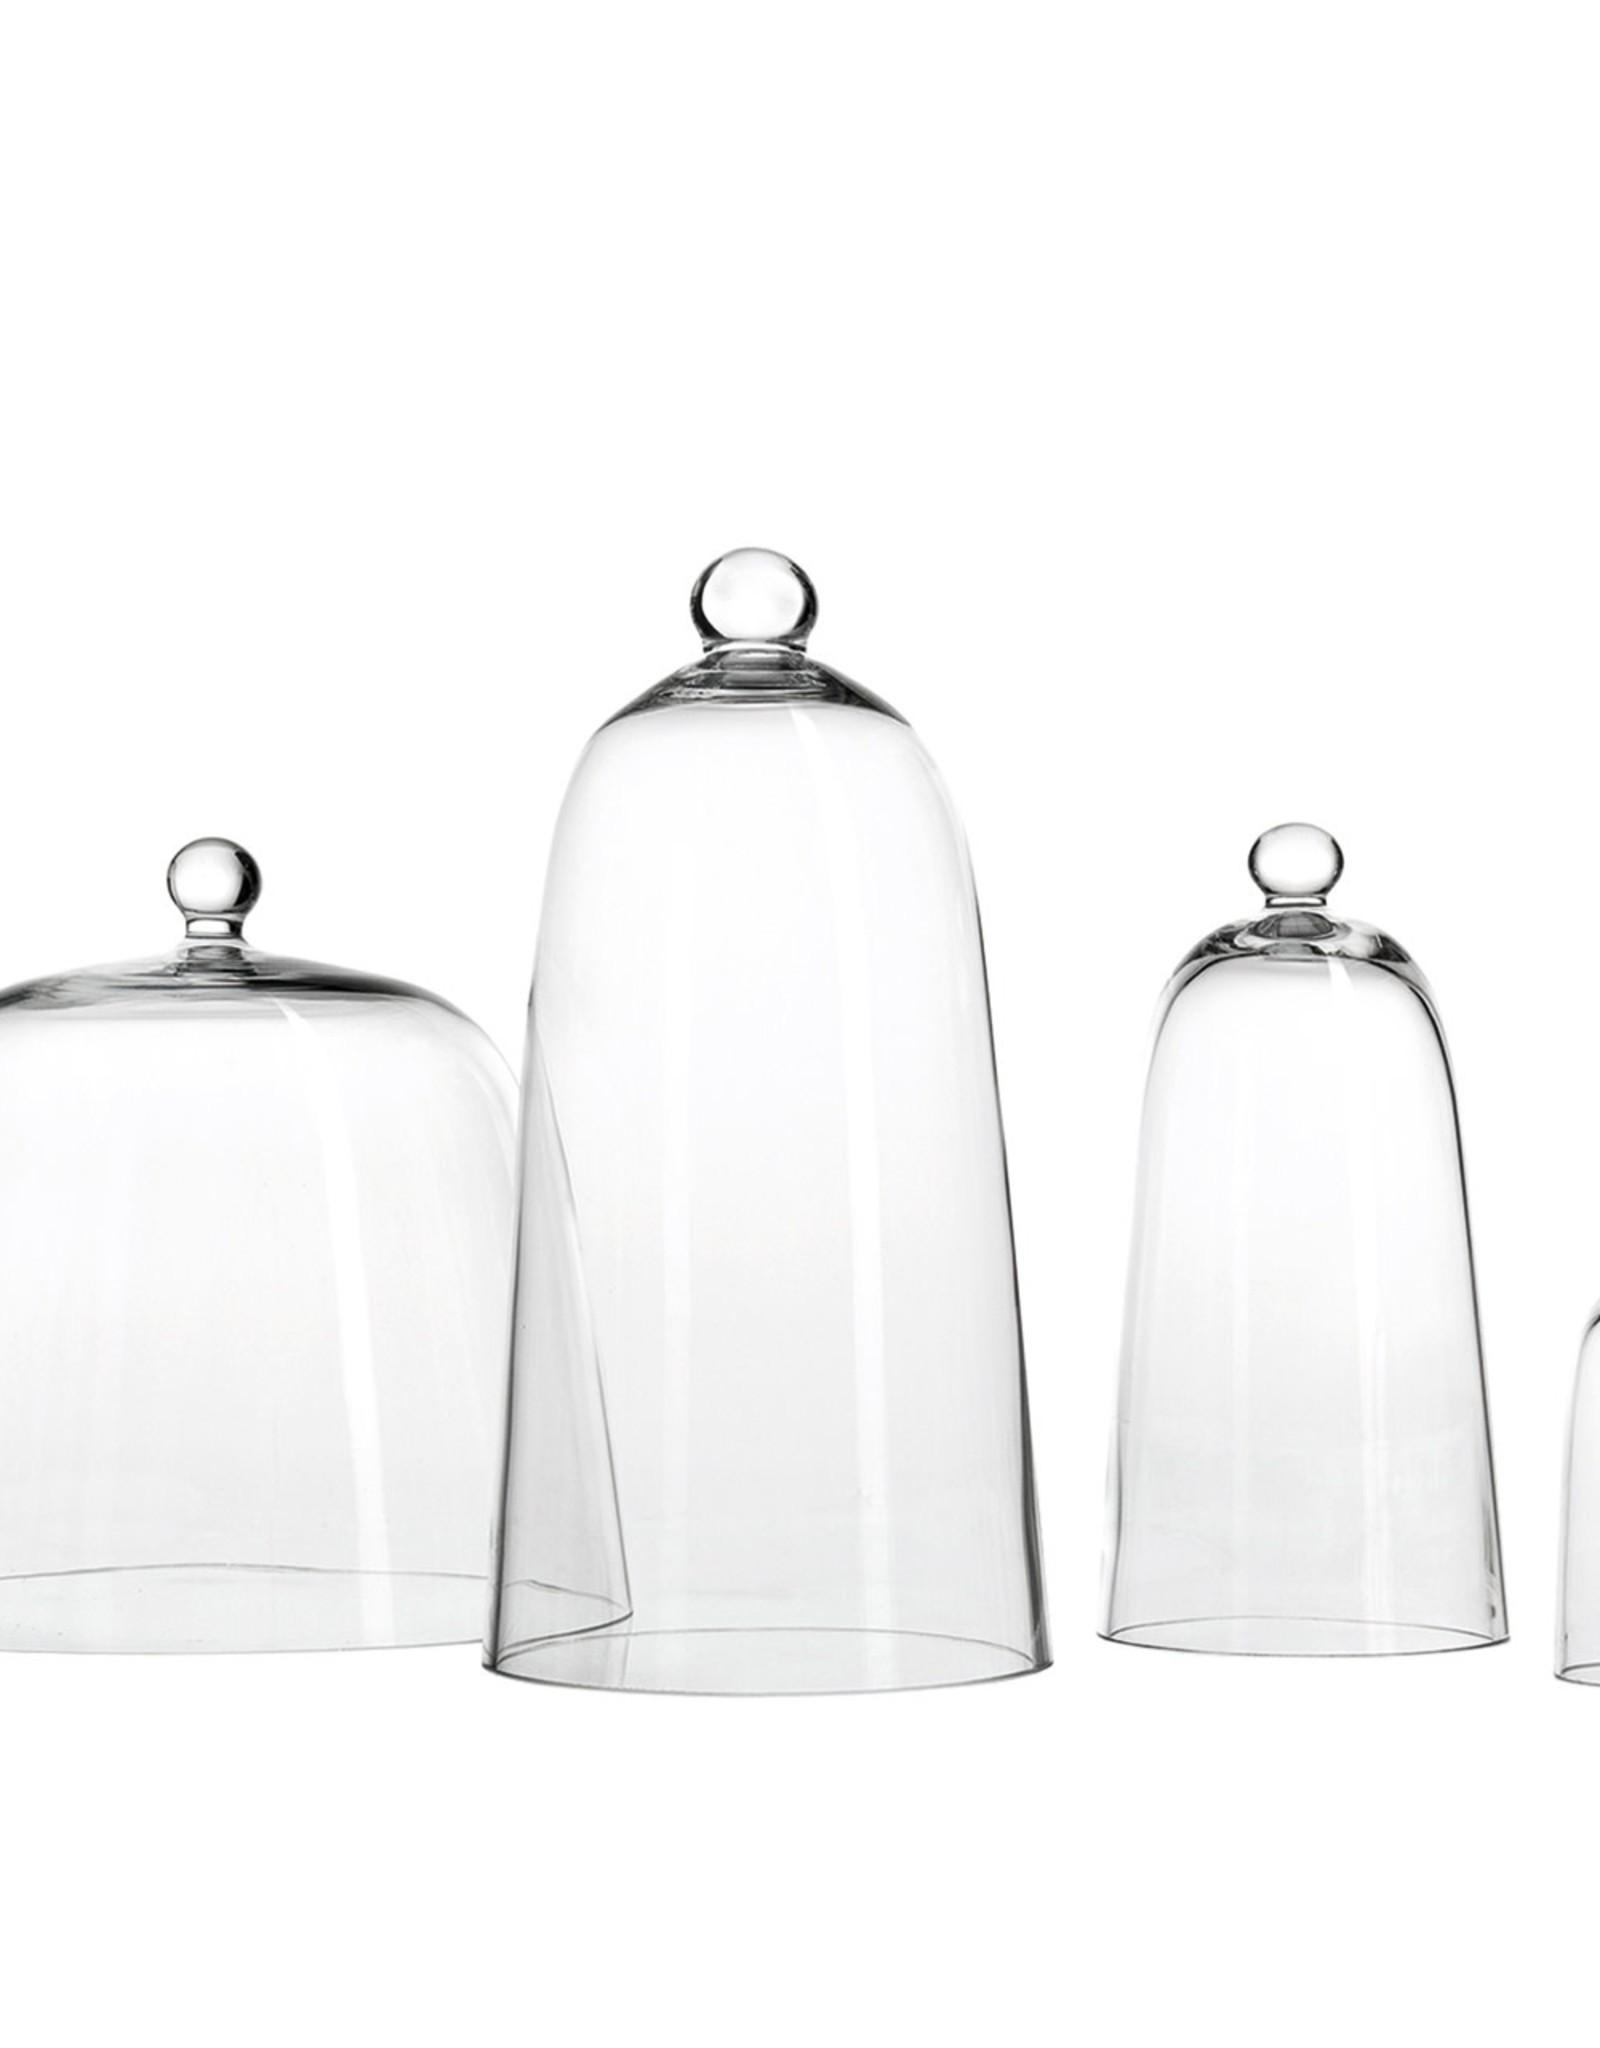 Raumgestalt Petite Cloche en verre H 15 cm